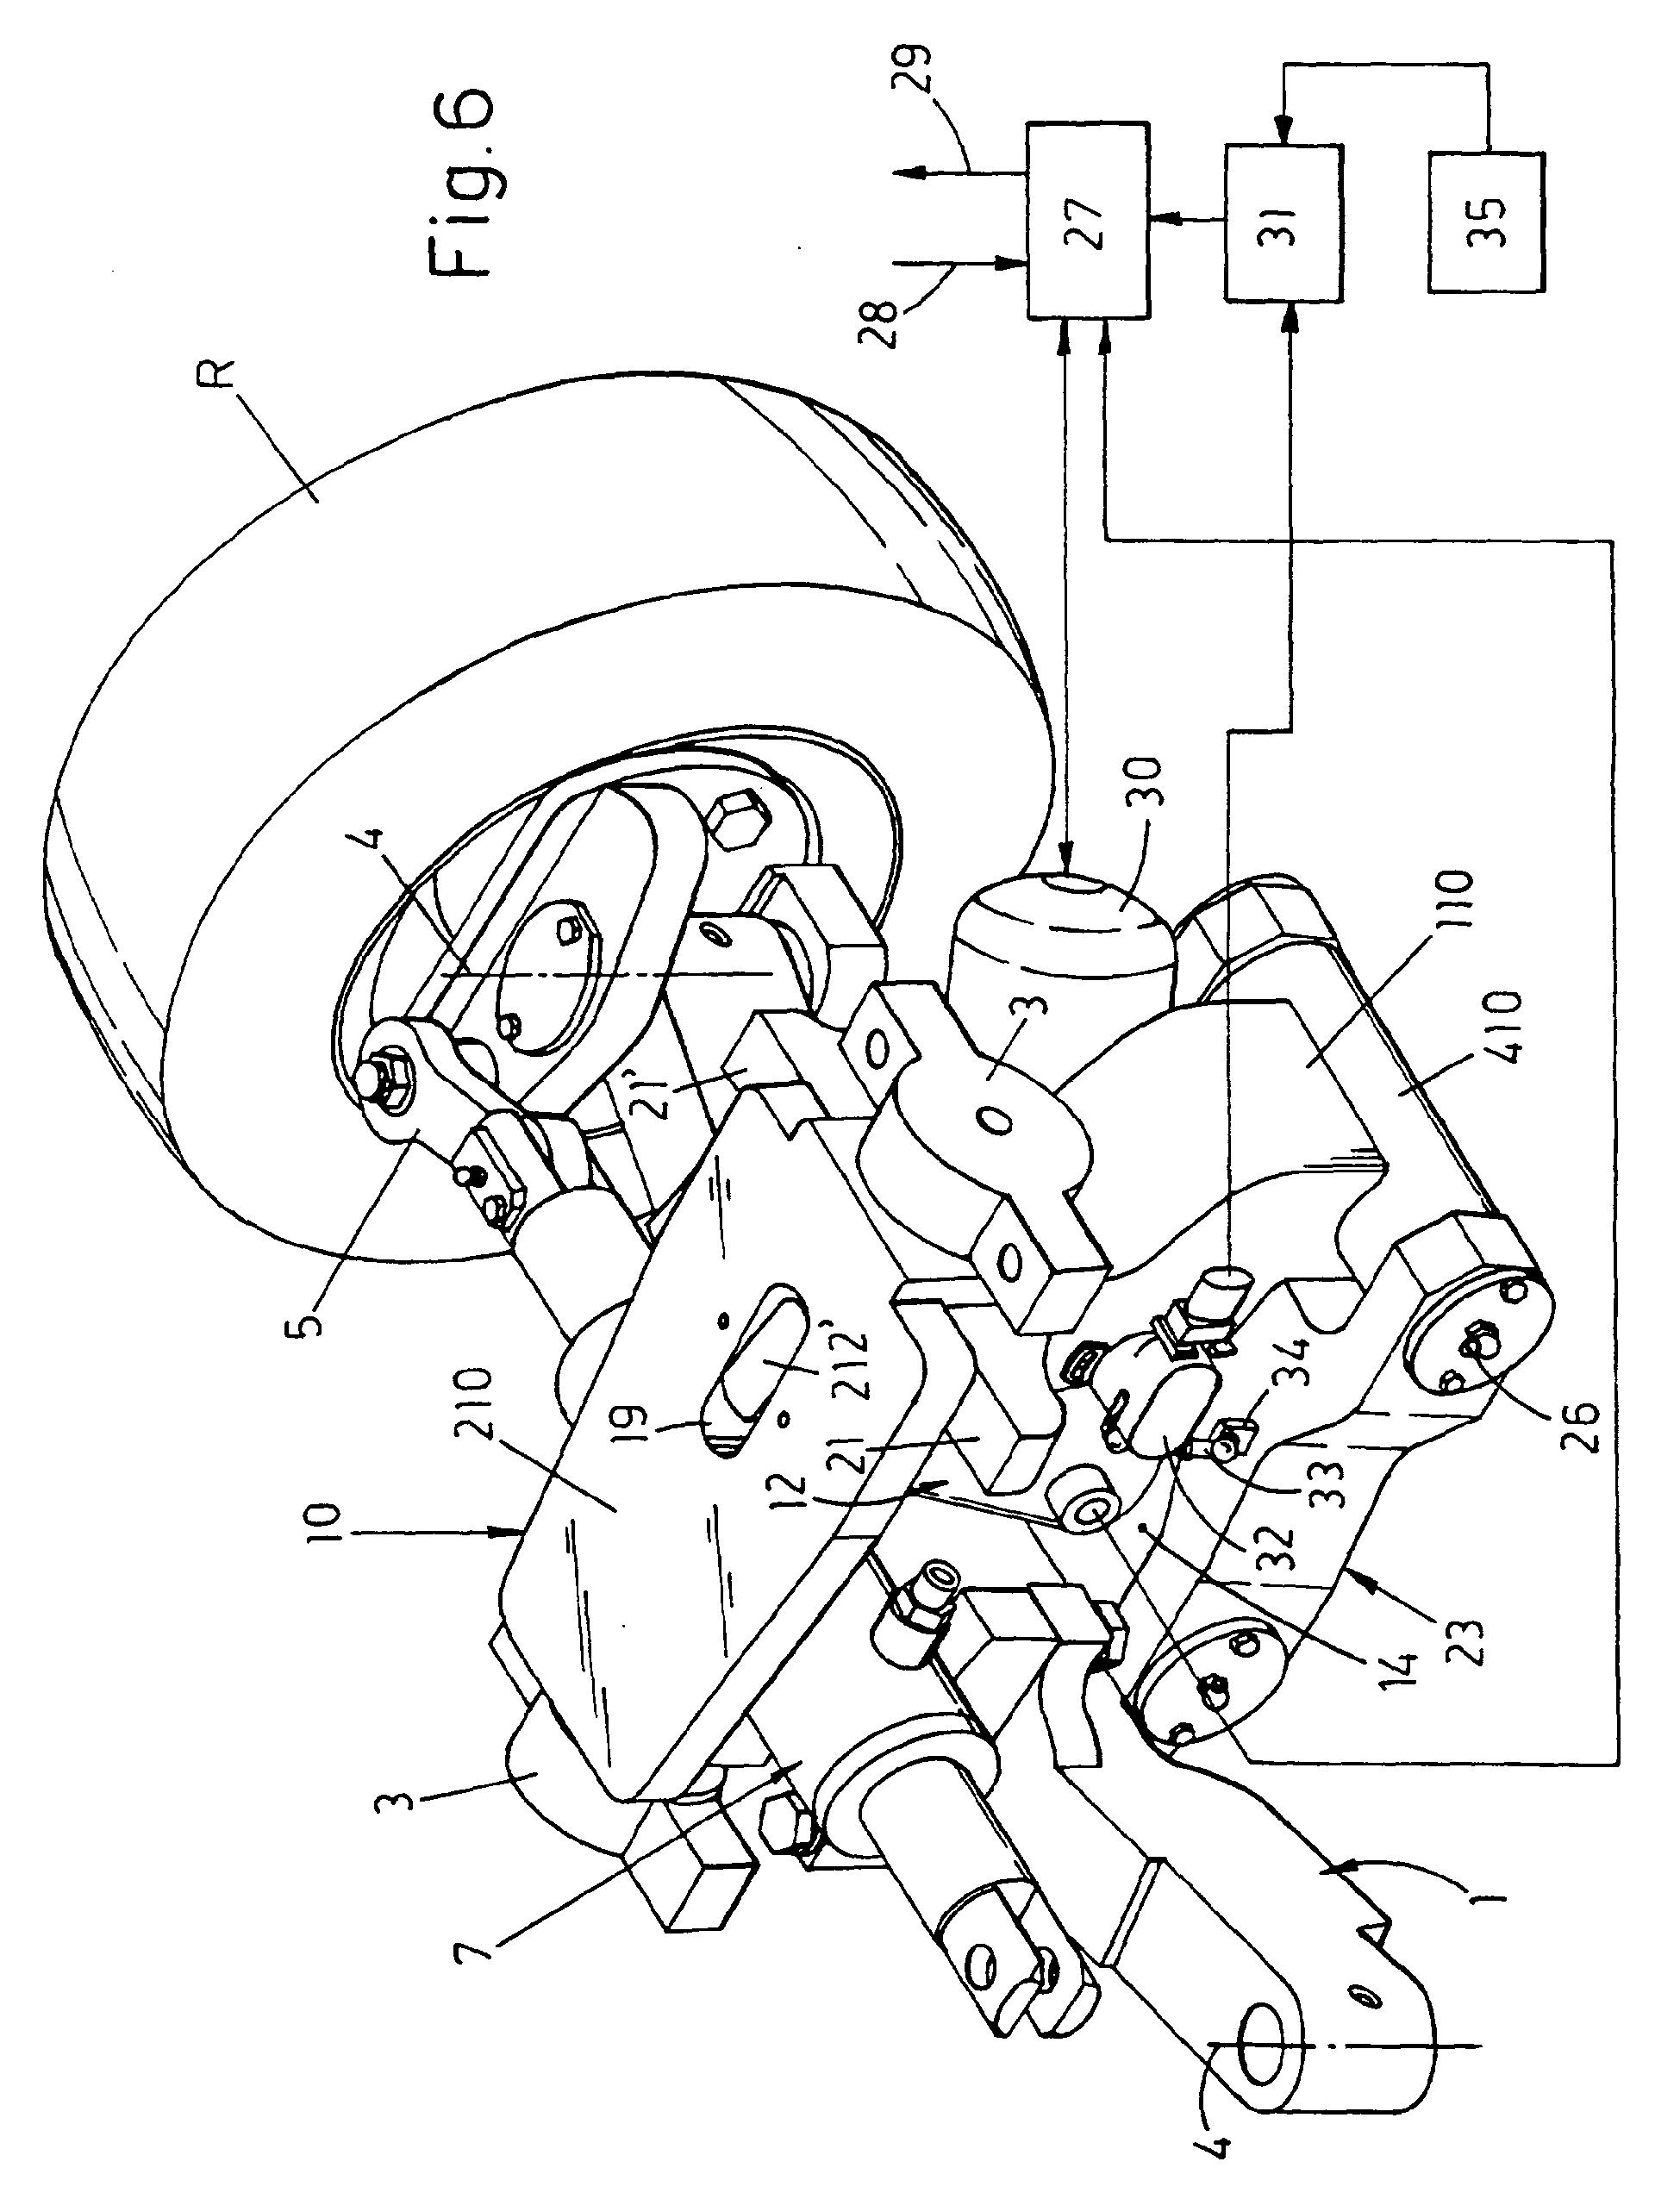 patent ep1162092b1 fahrzeugaufh ngung mit zwei lenkbare. Black Bedroom Furniture Sets. Home Design Ideas